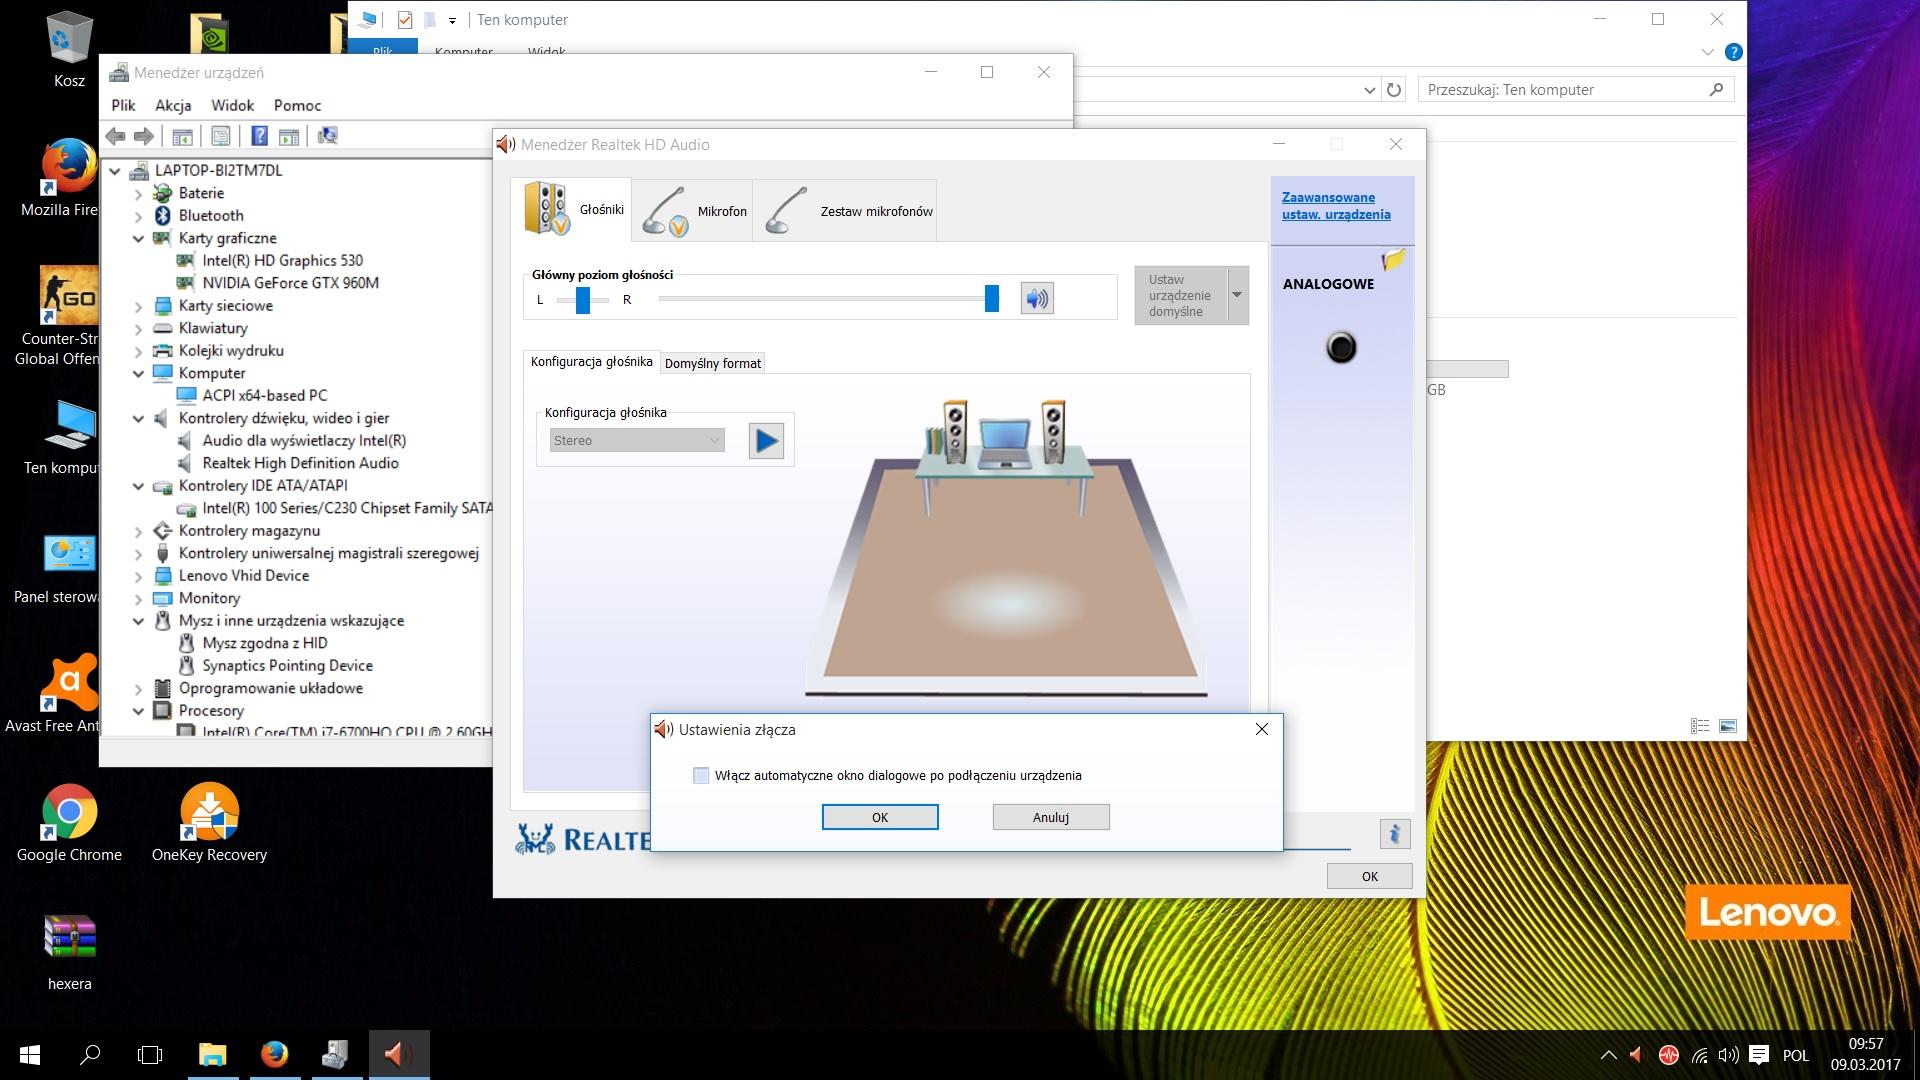 Windows10 steelseries słuchawki problem ForumPC.pl